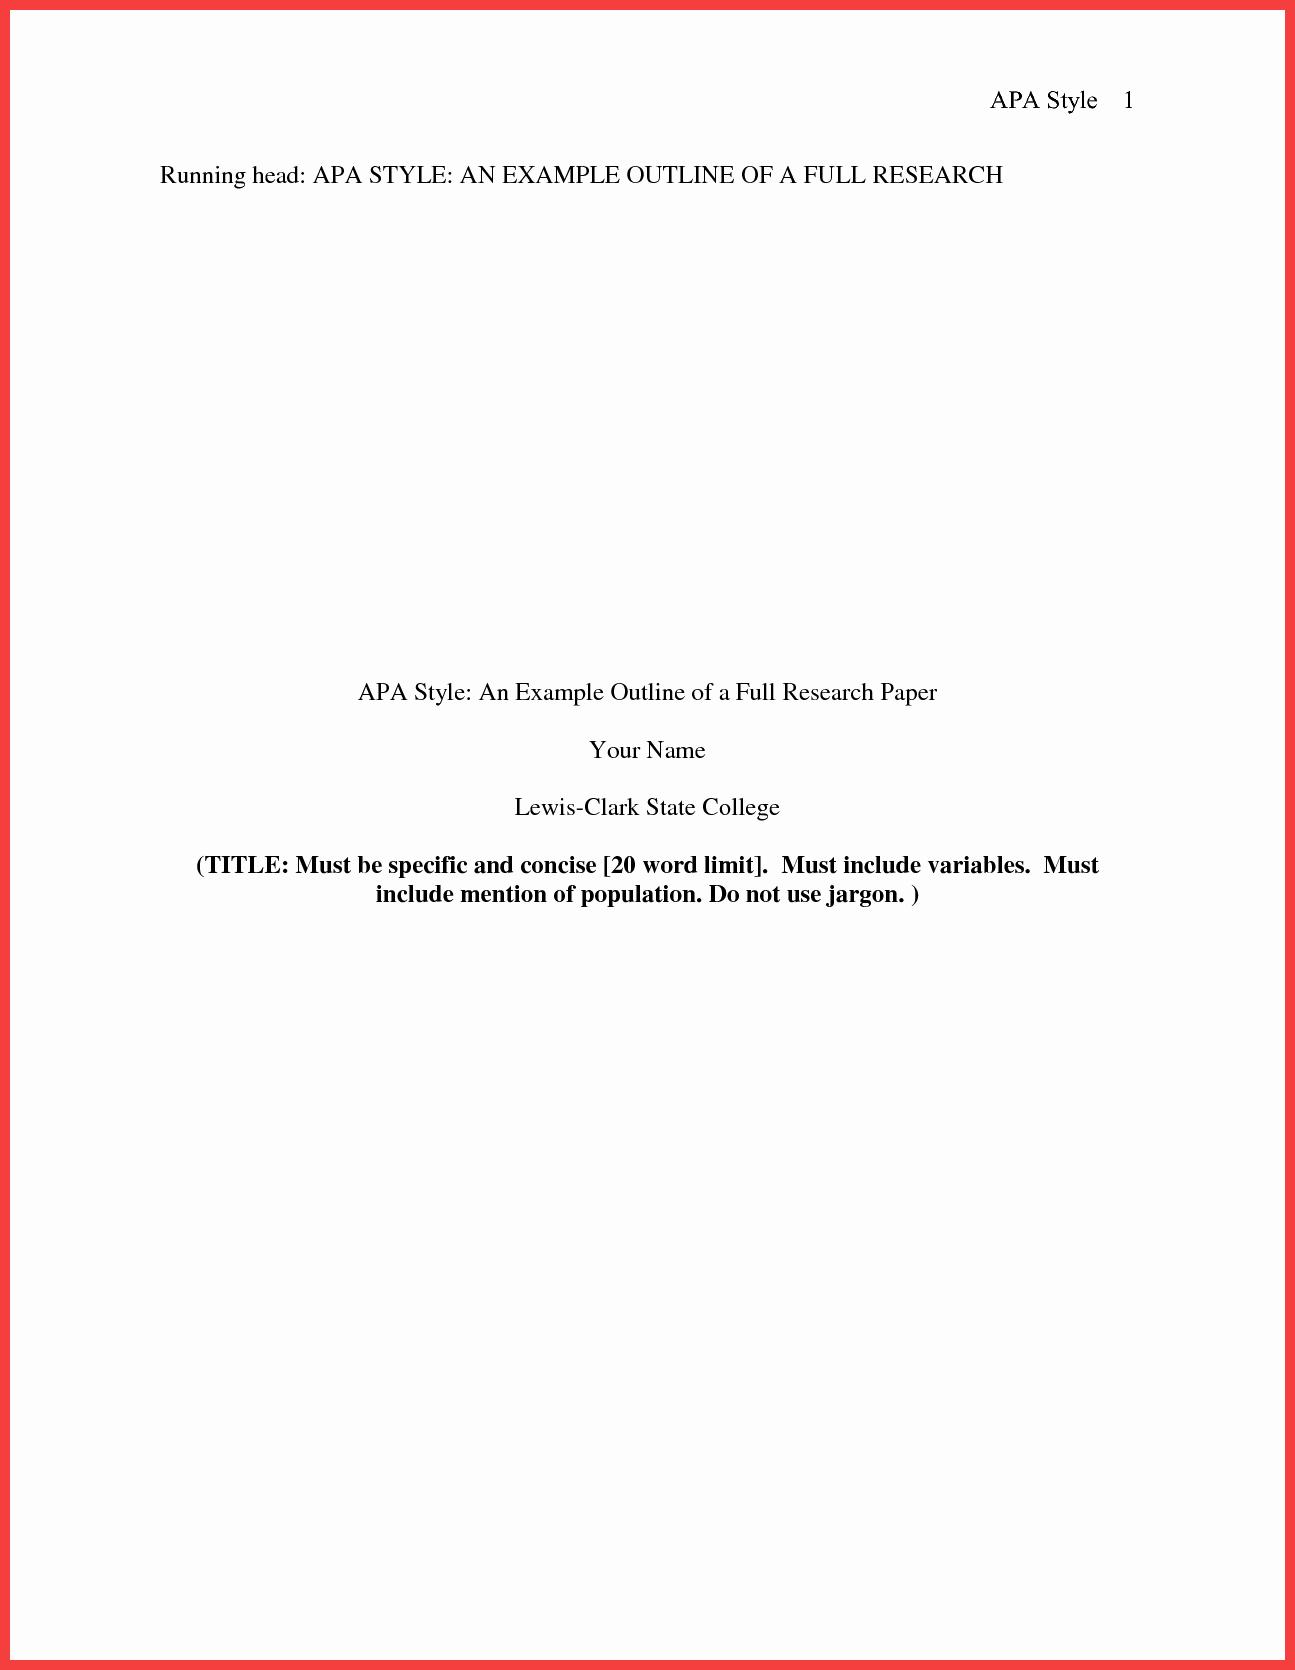 Apa Title Page Example 2016 Unique Apa format Title Page 2016